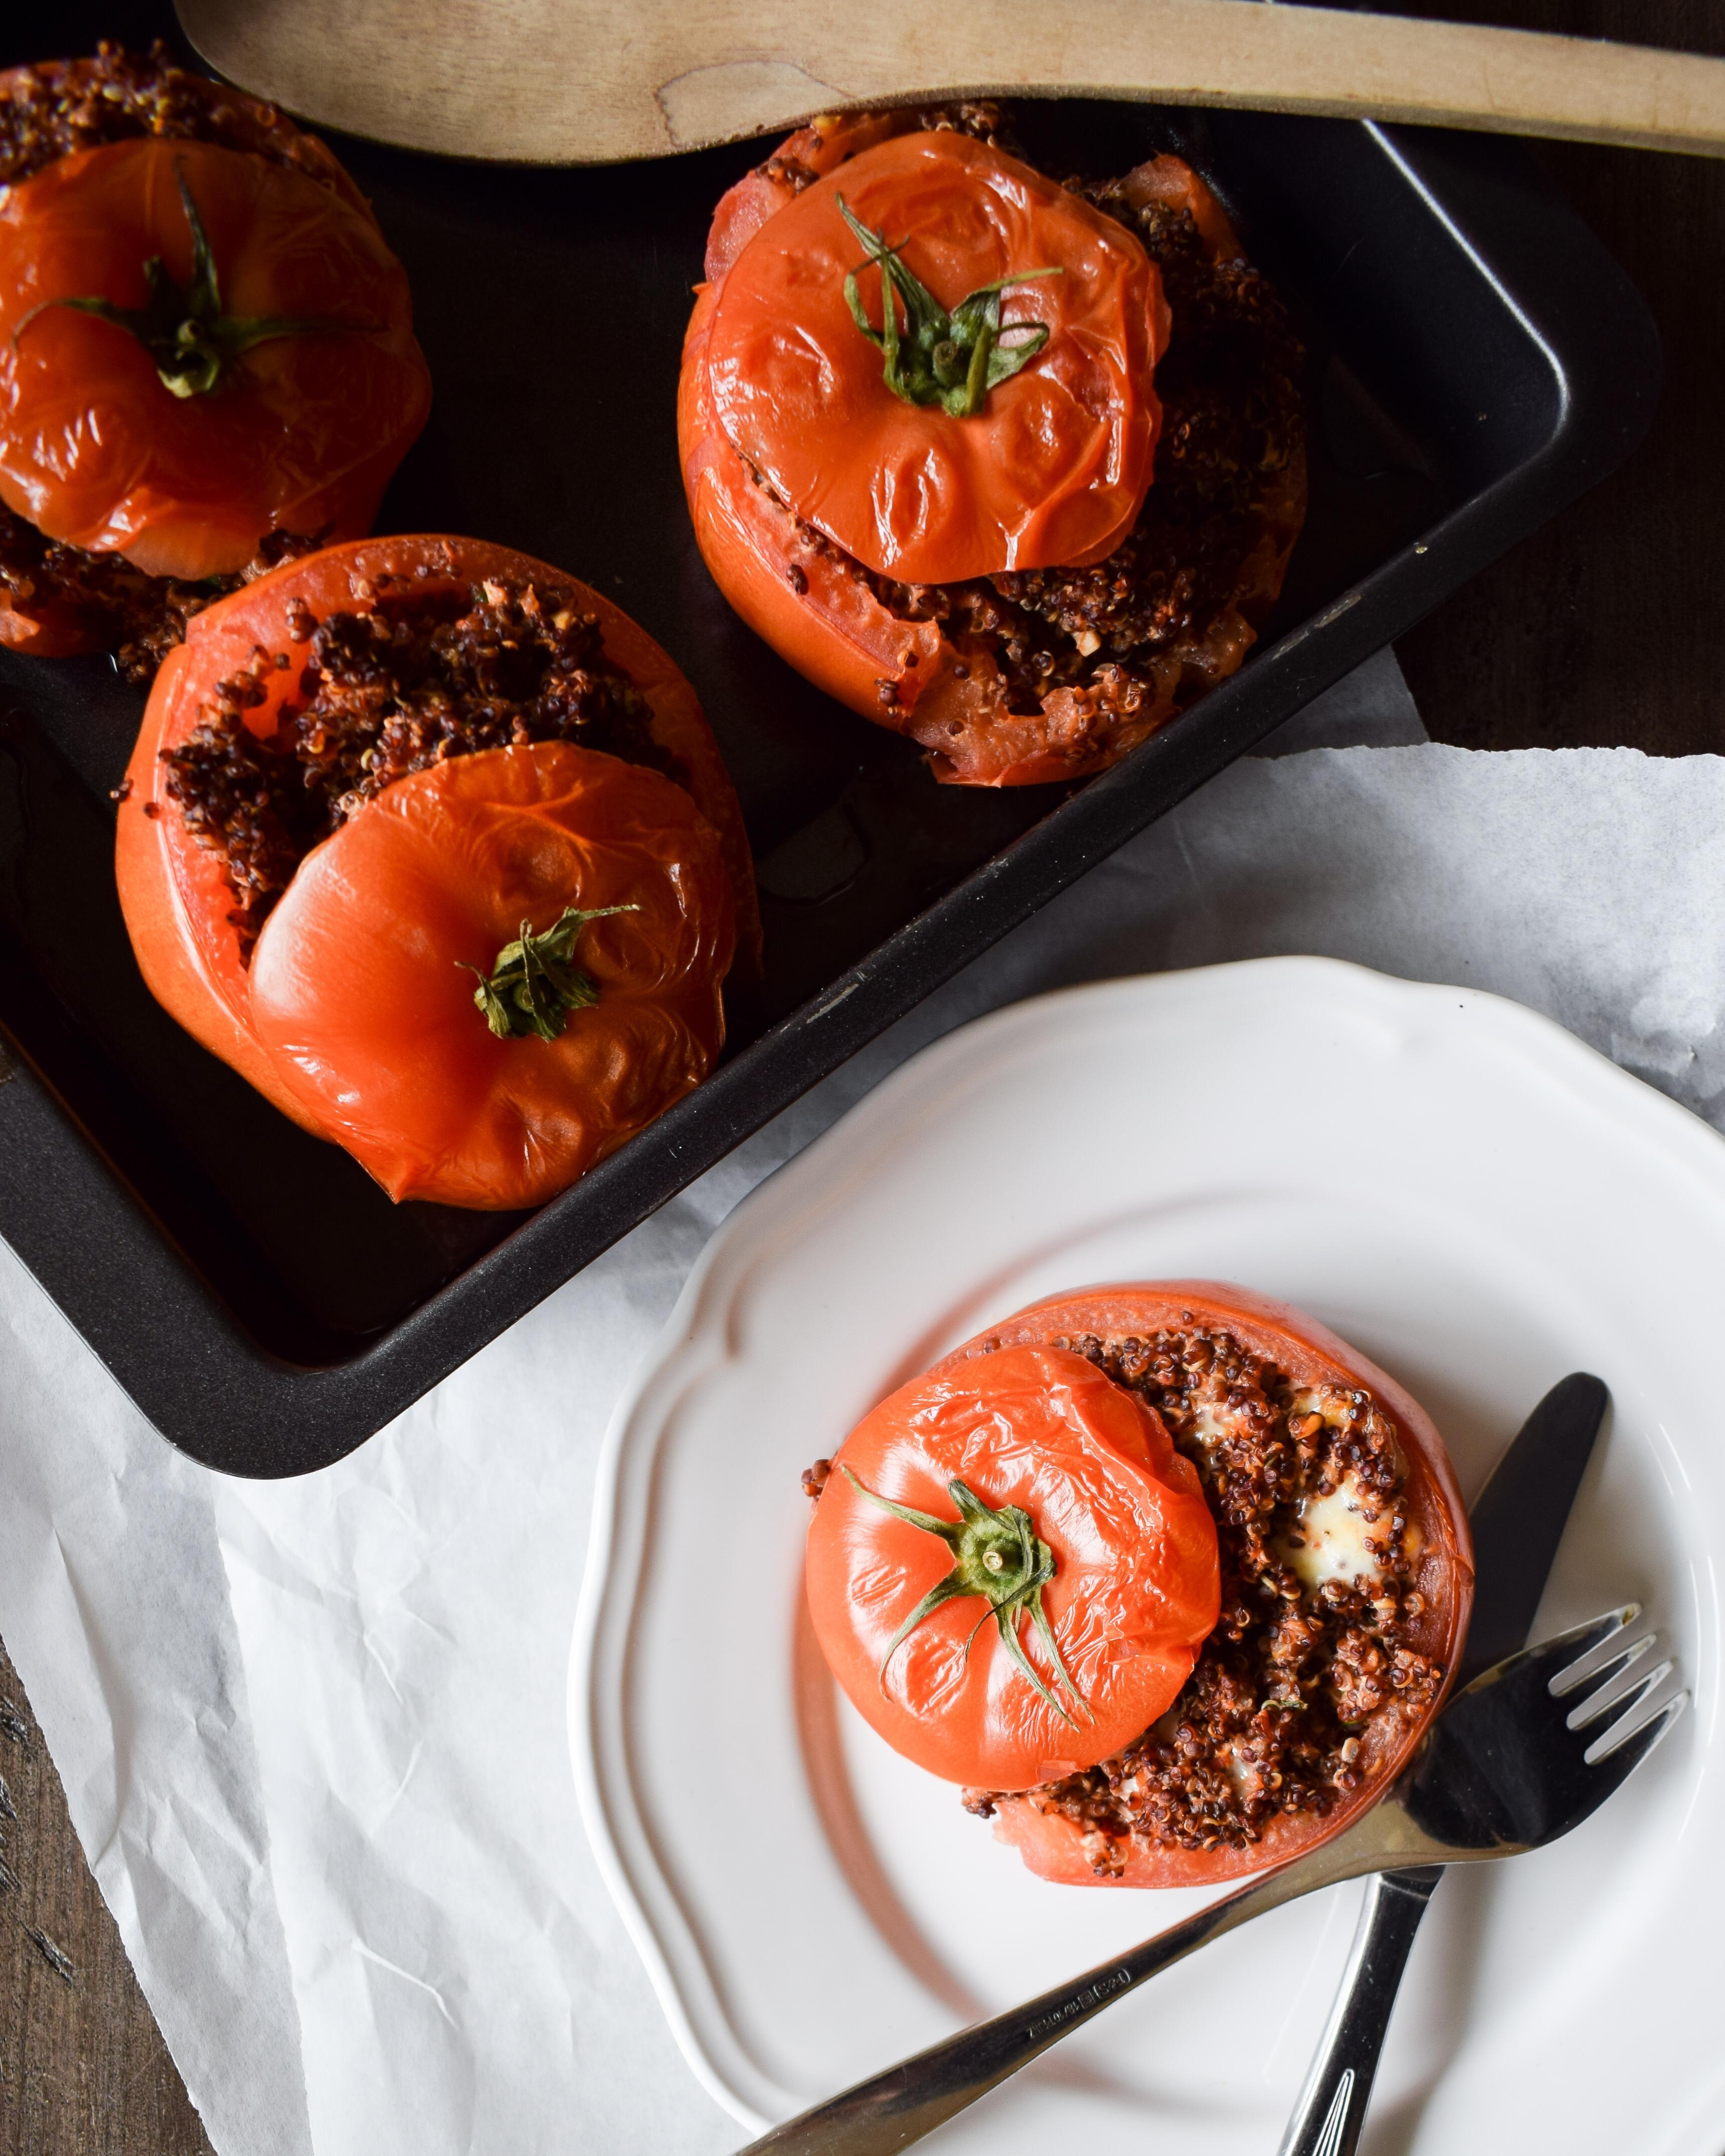 Gefüllte Tomaten mit rotem Quinoa